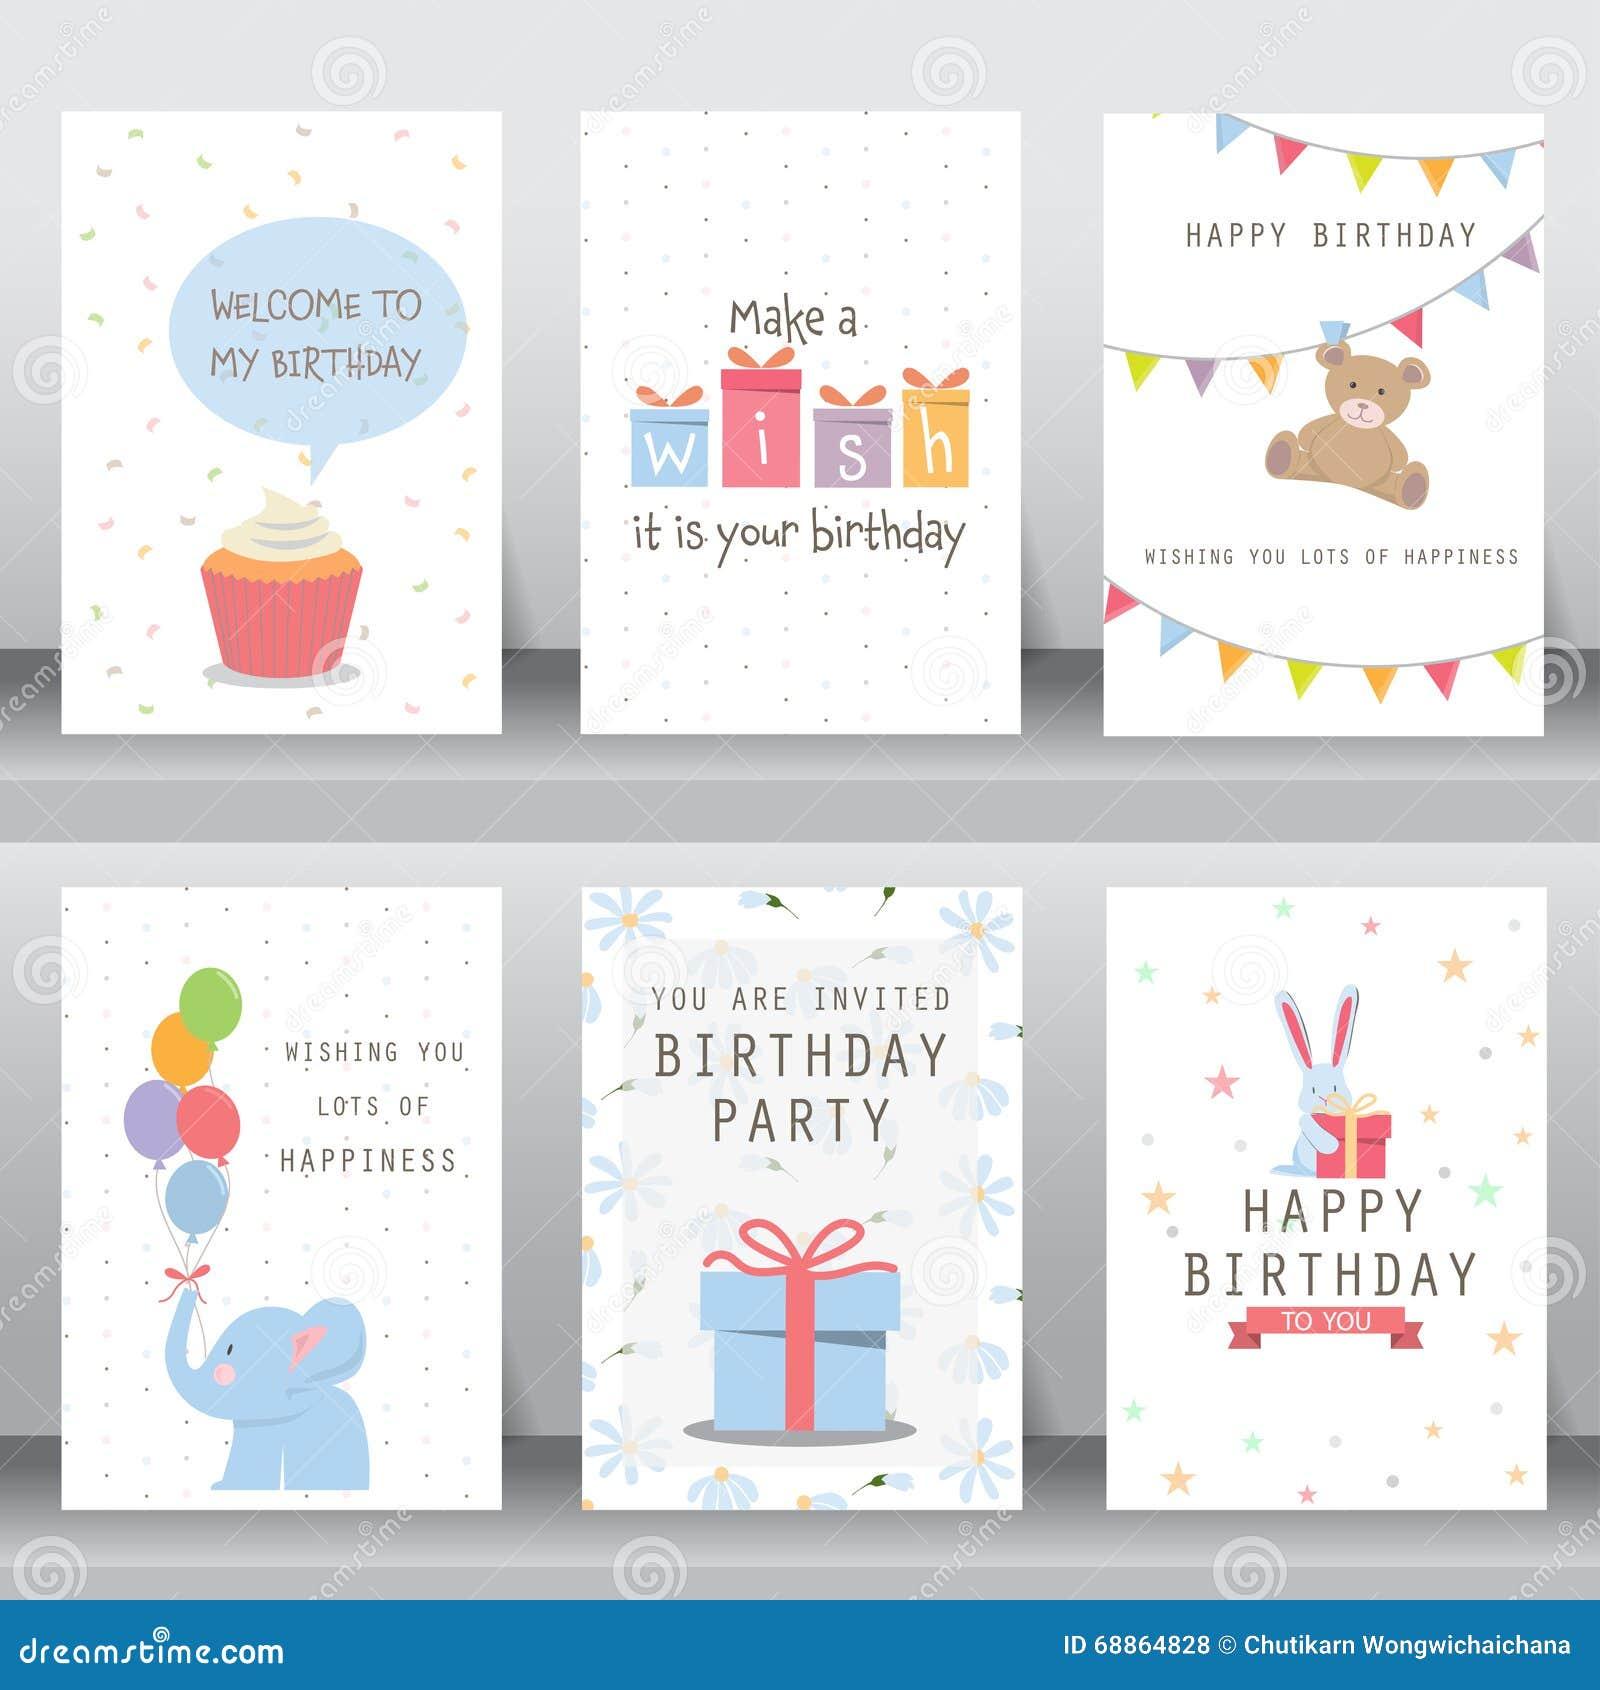 Holiday Greeting And Invitation Card Stock Vector